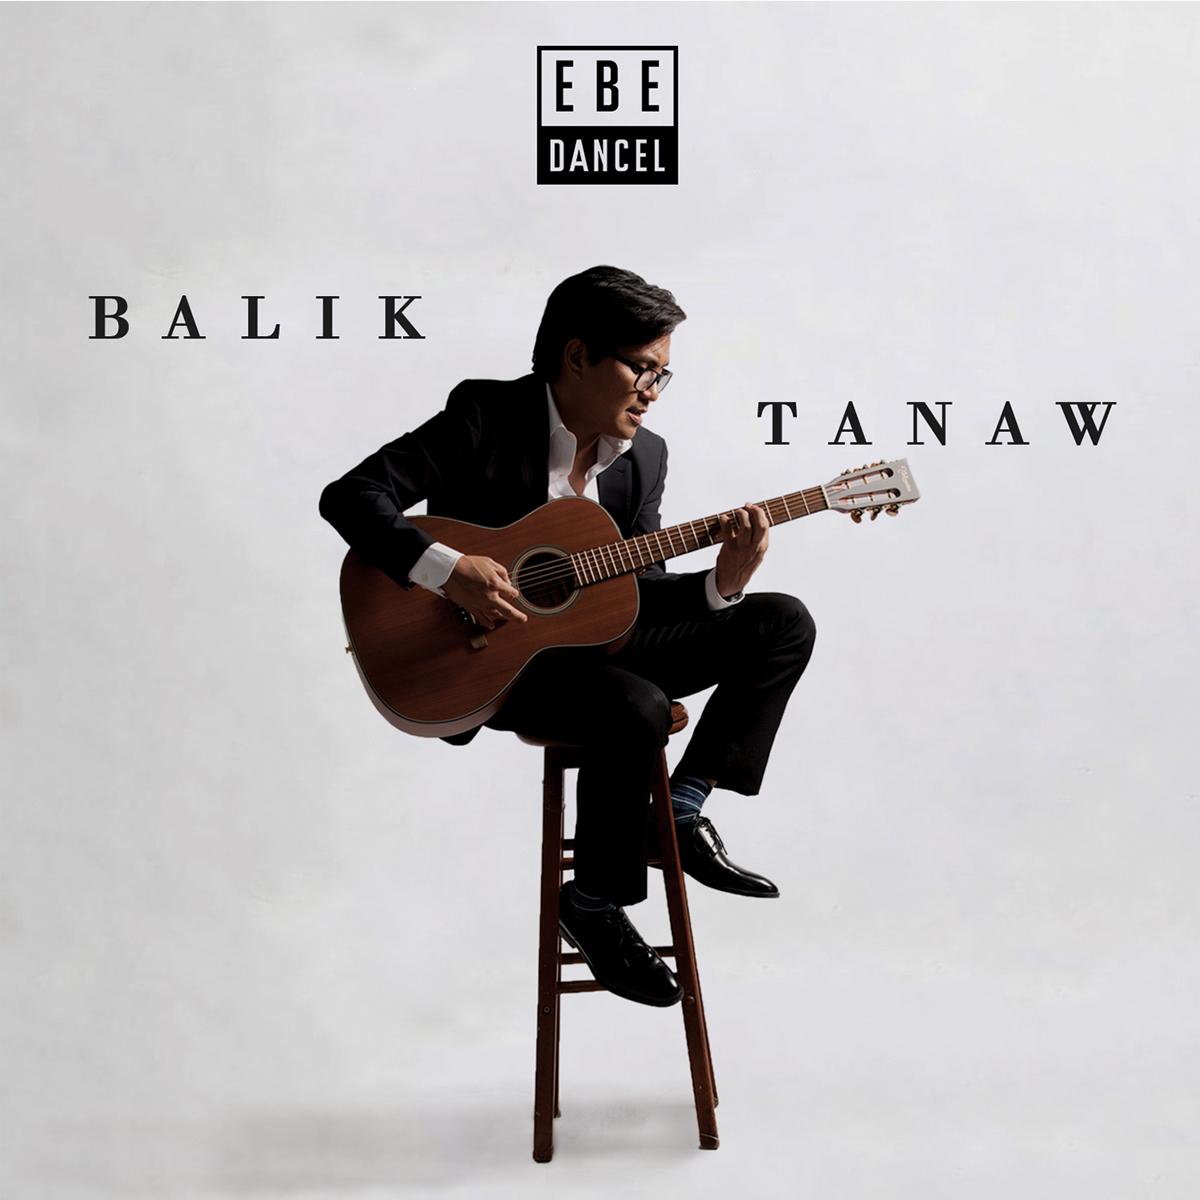 Ebe Dancel Baliktanaw album 2020 review Sugarfree